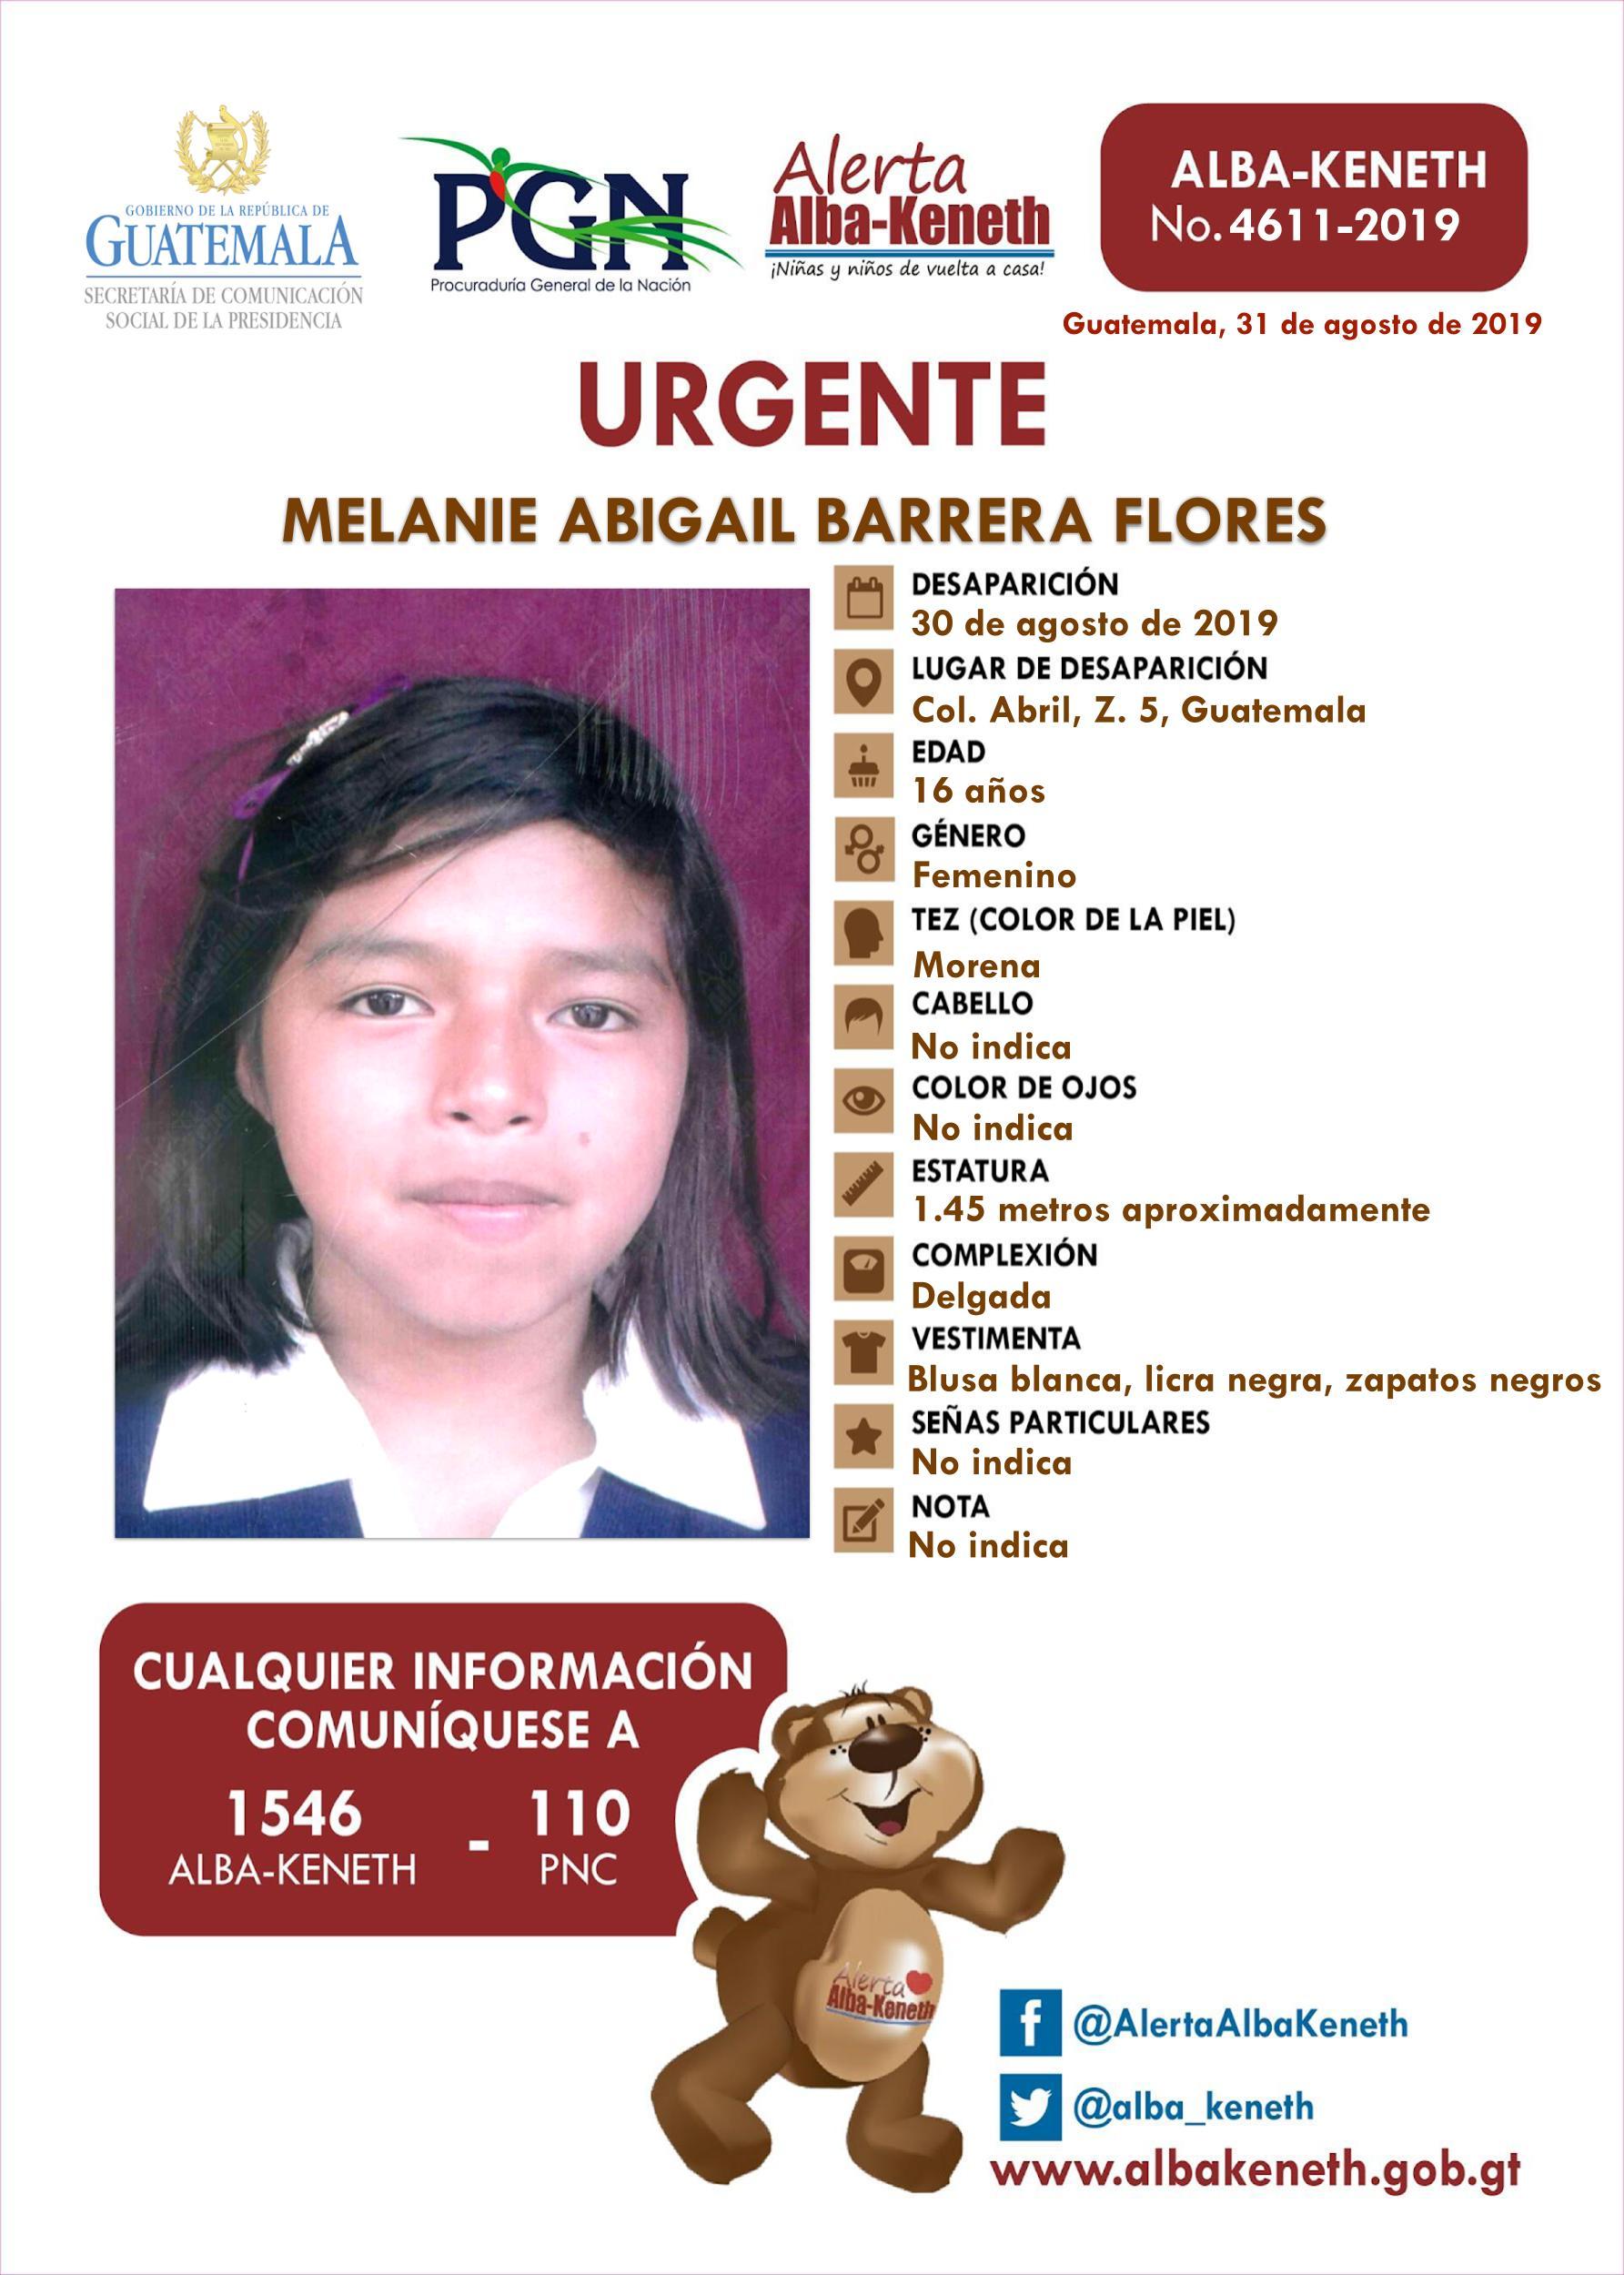 Melanie Abigail Barrera Flores